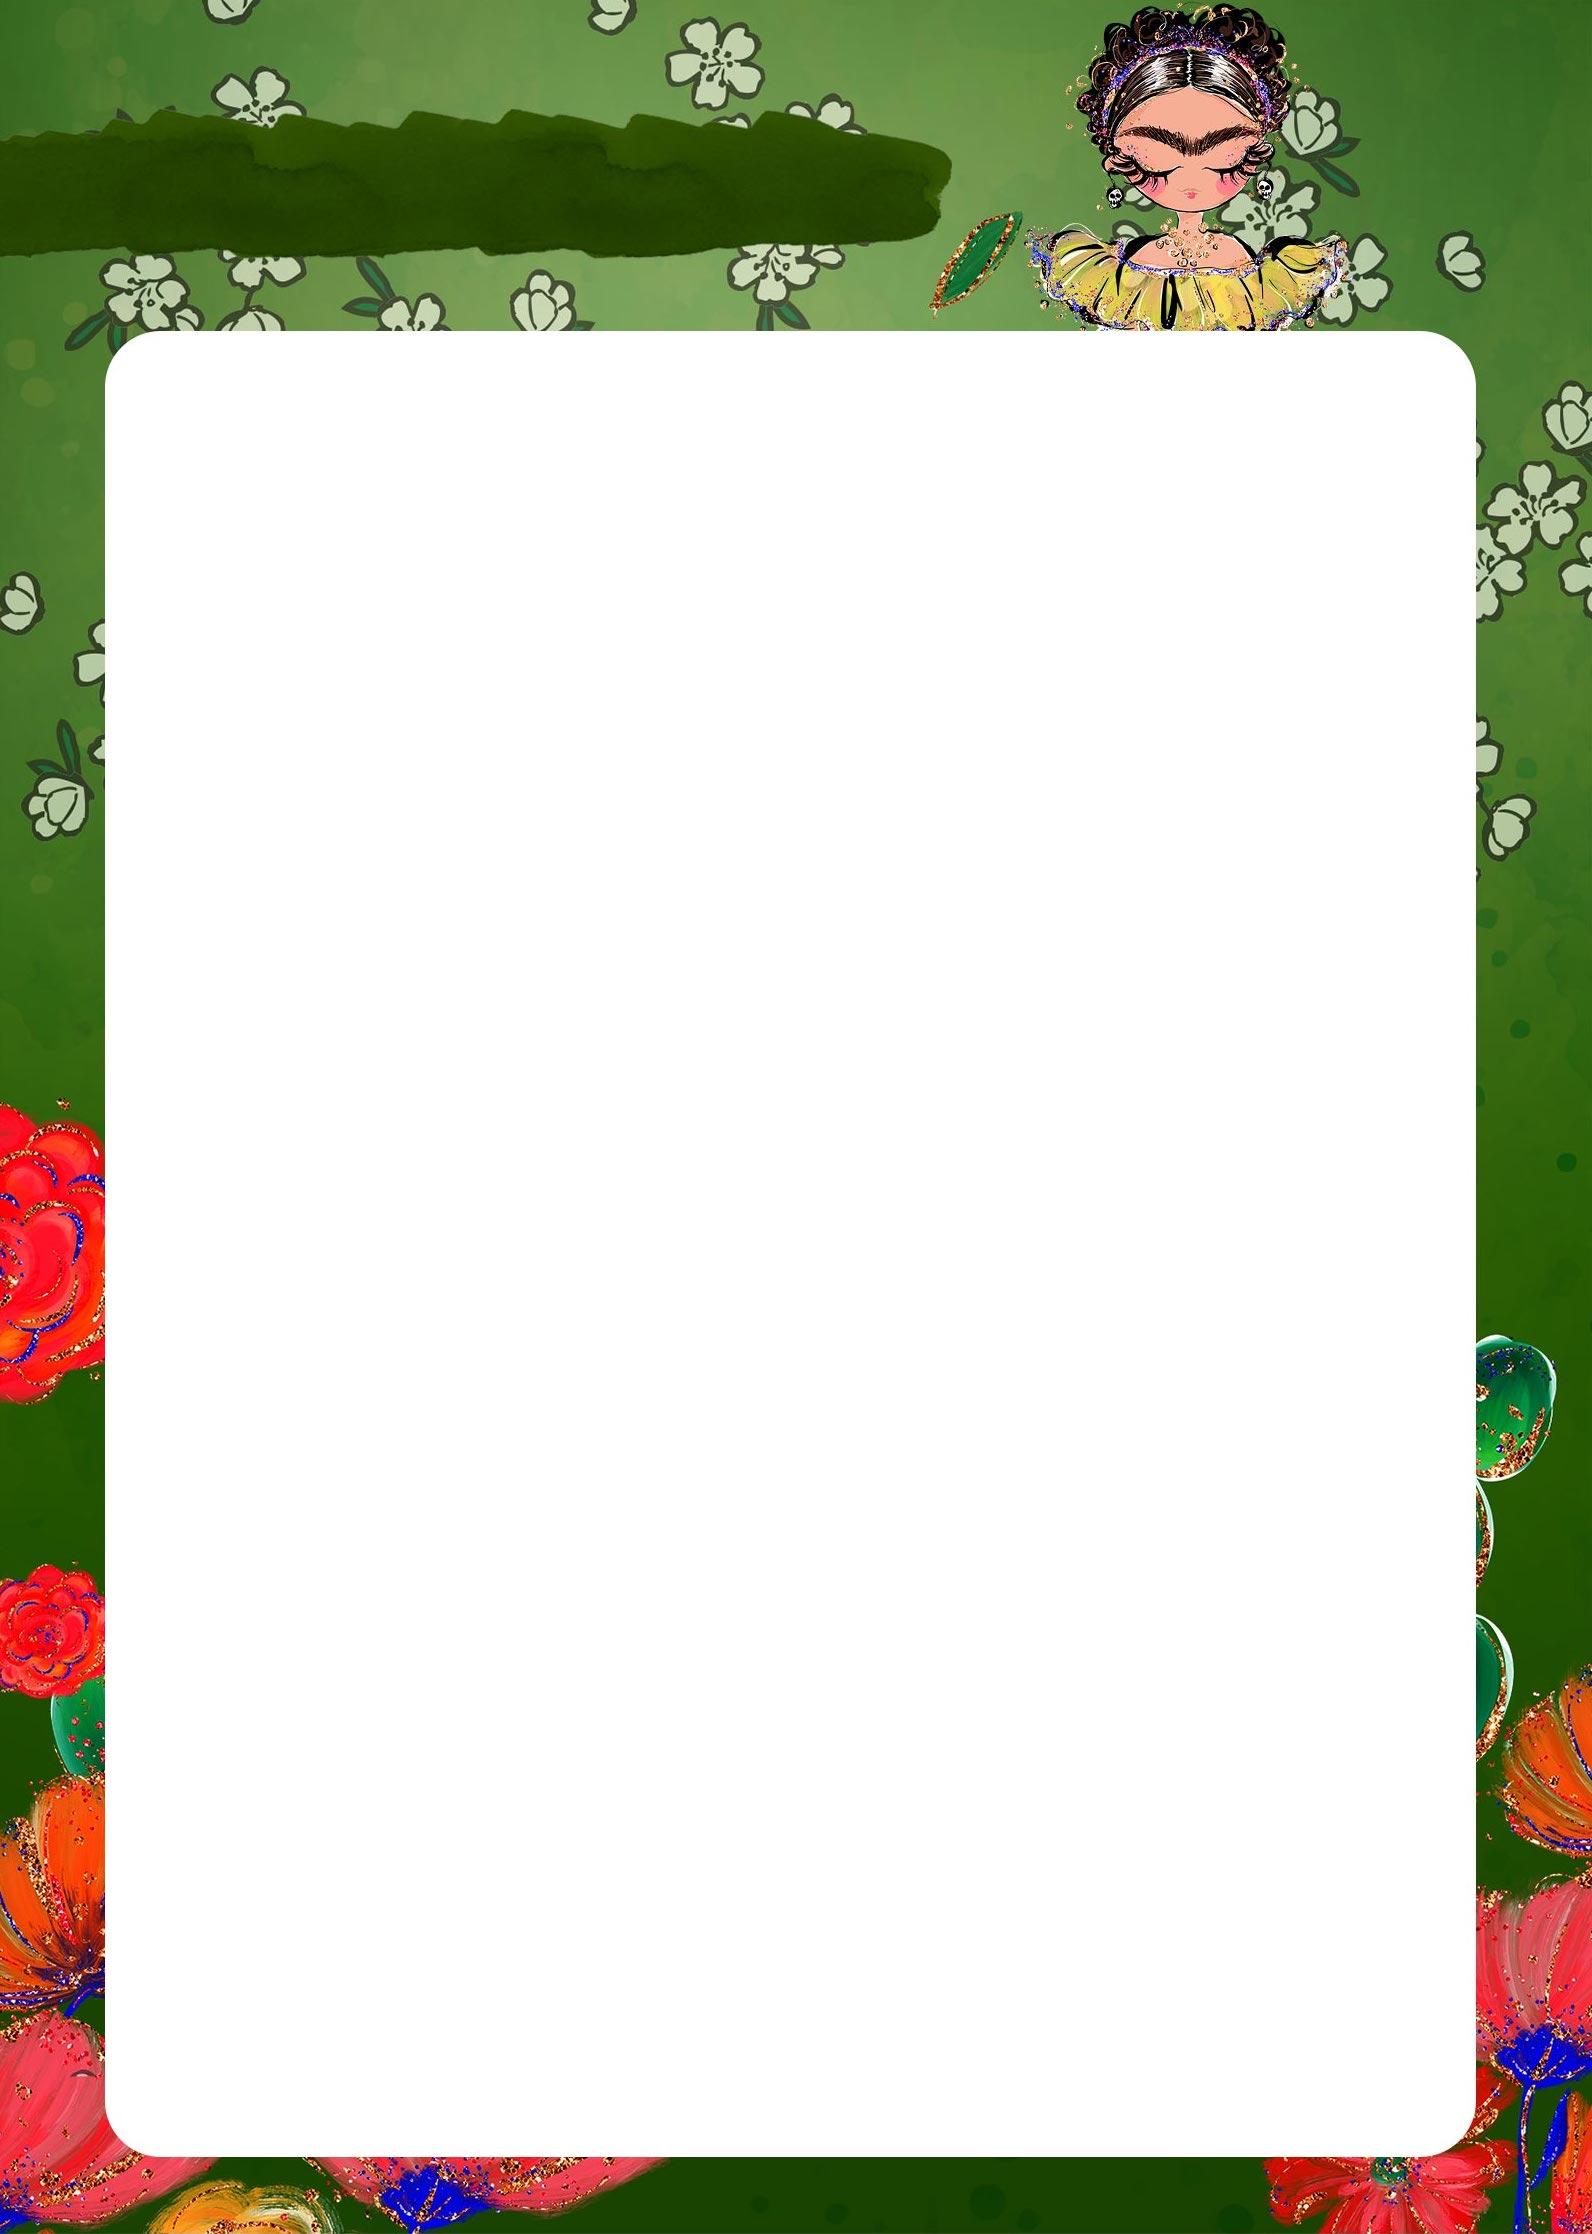 Planner Frida pagina em branco